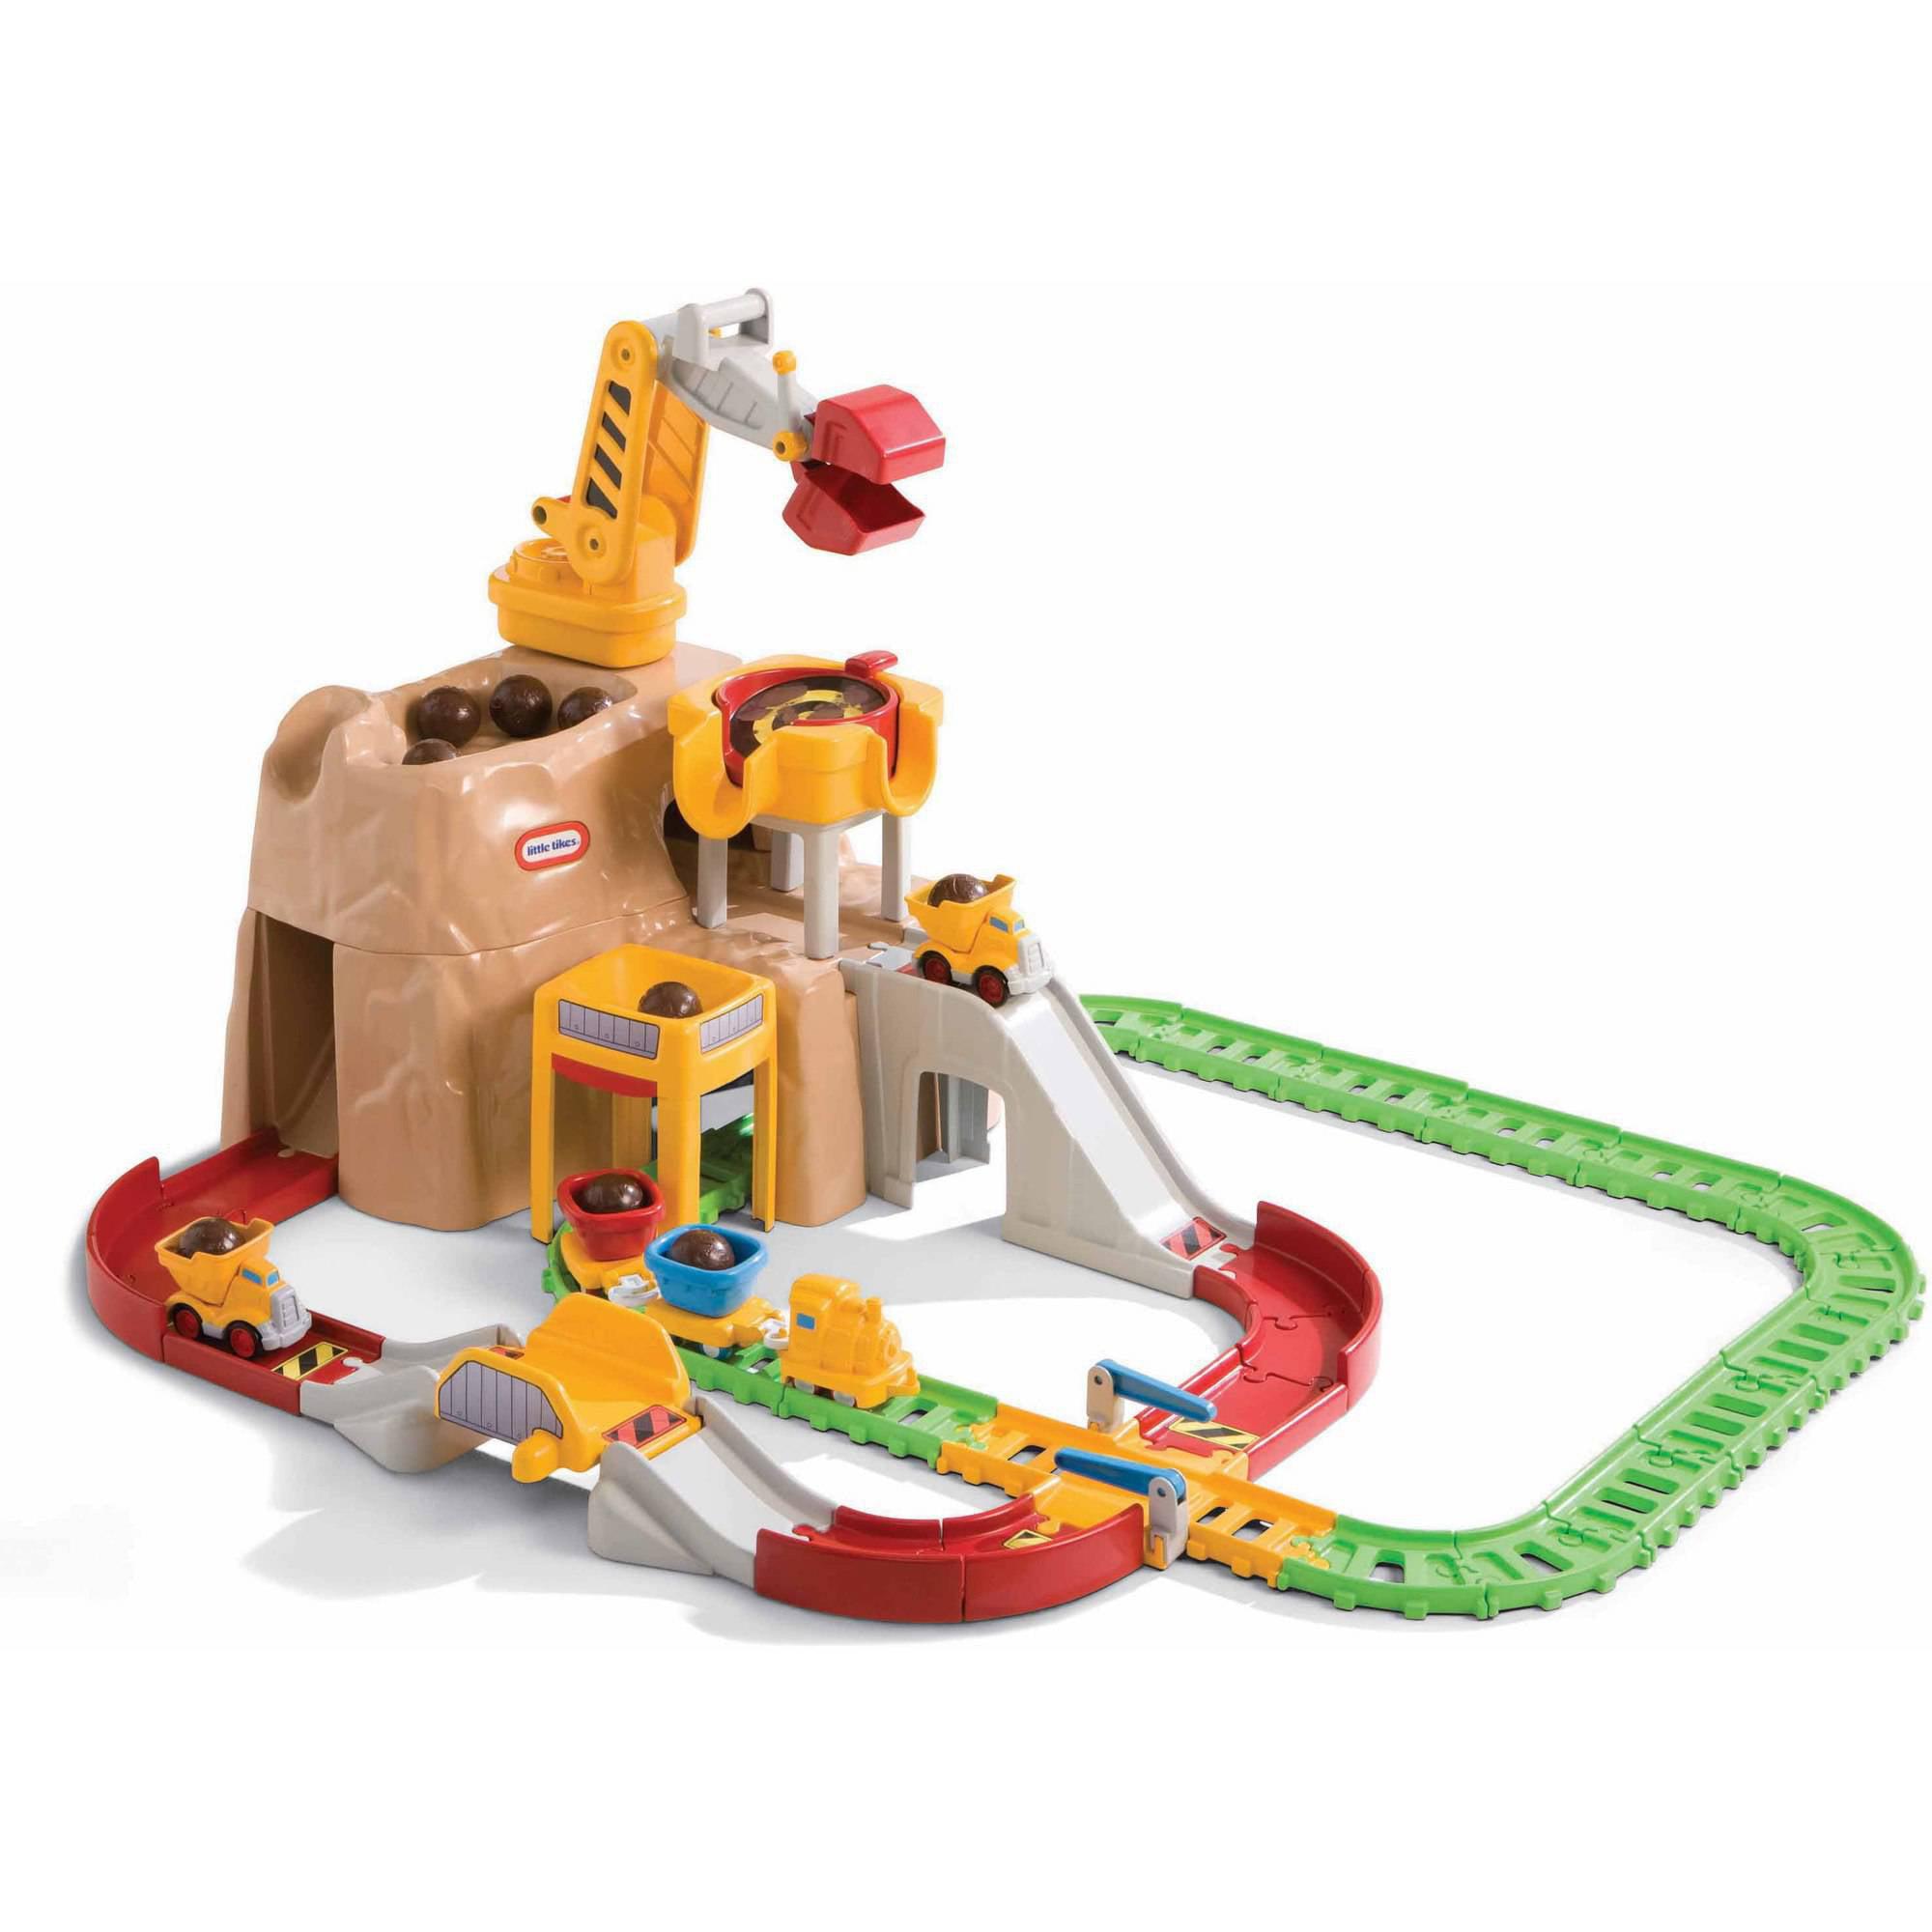 Little Tikes Big Adventures Construction Peak Rail and Road Play Set ...